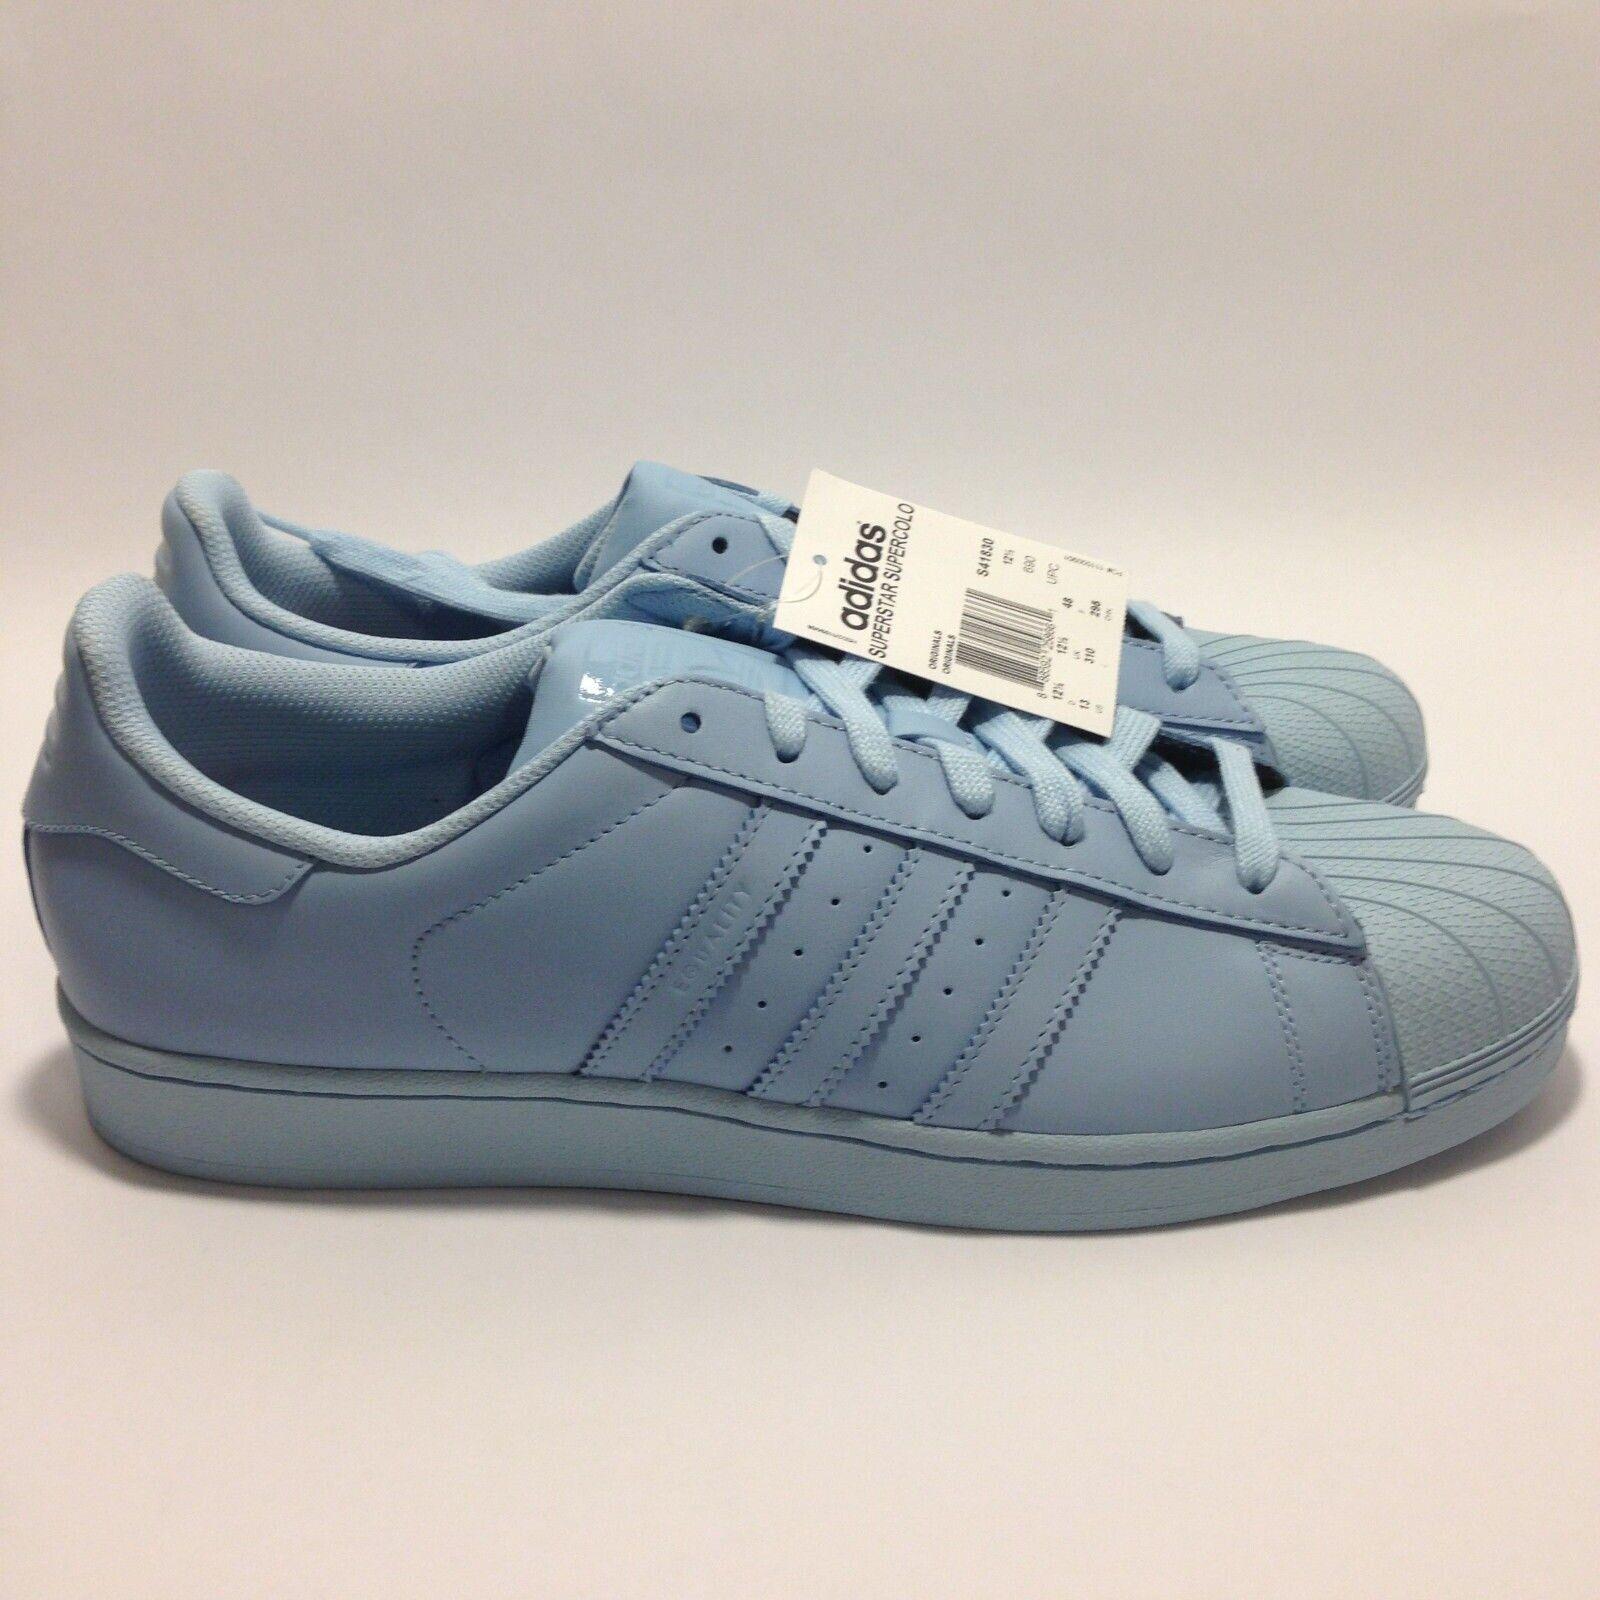 adidas superstar blue pharrell